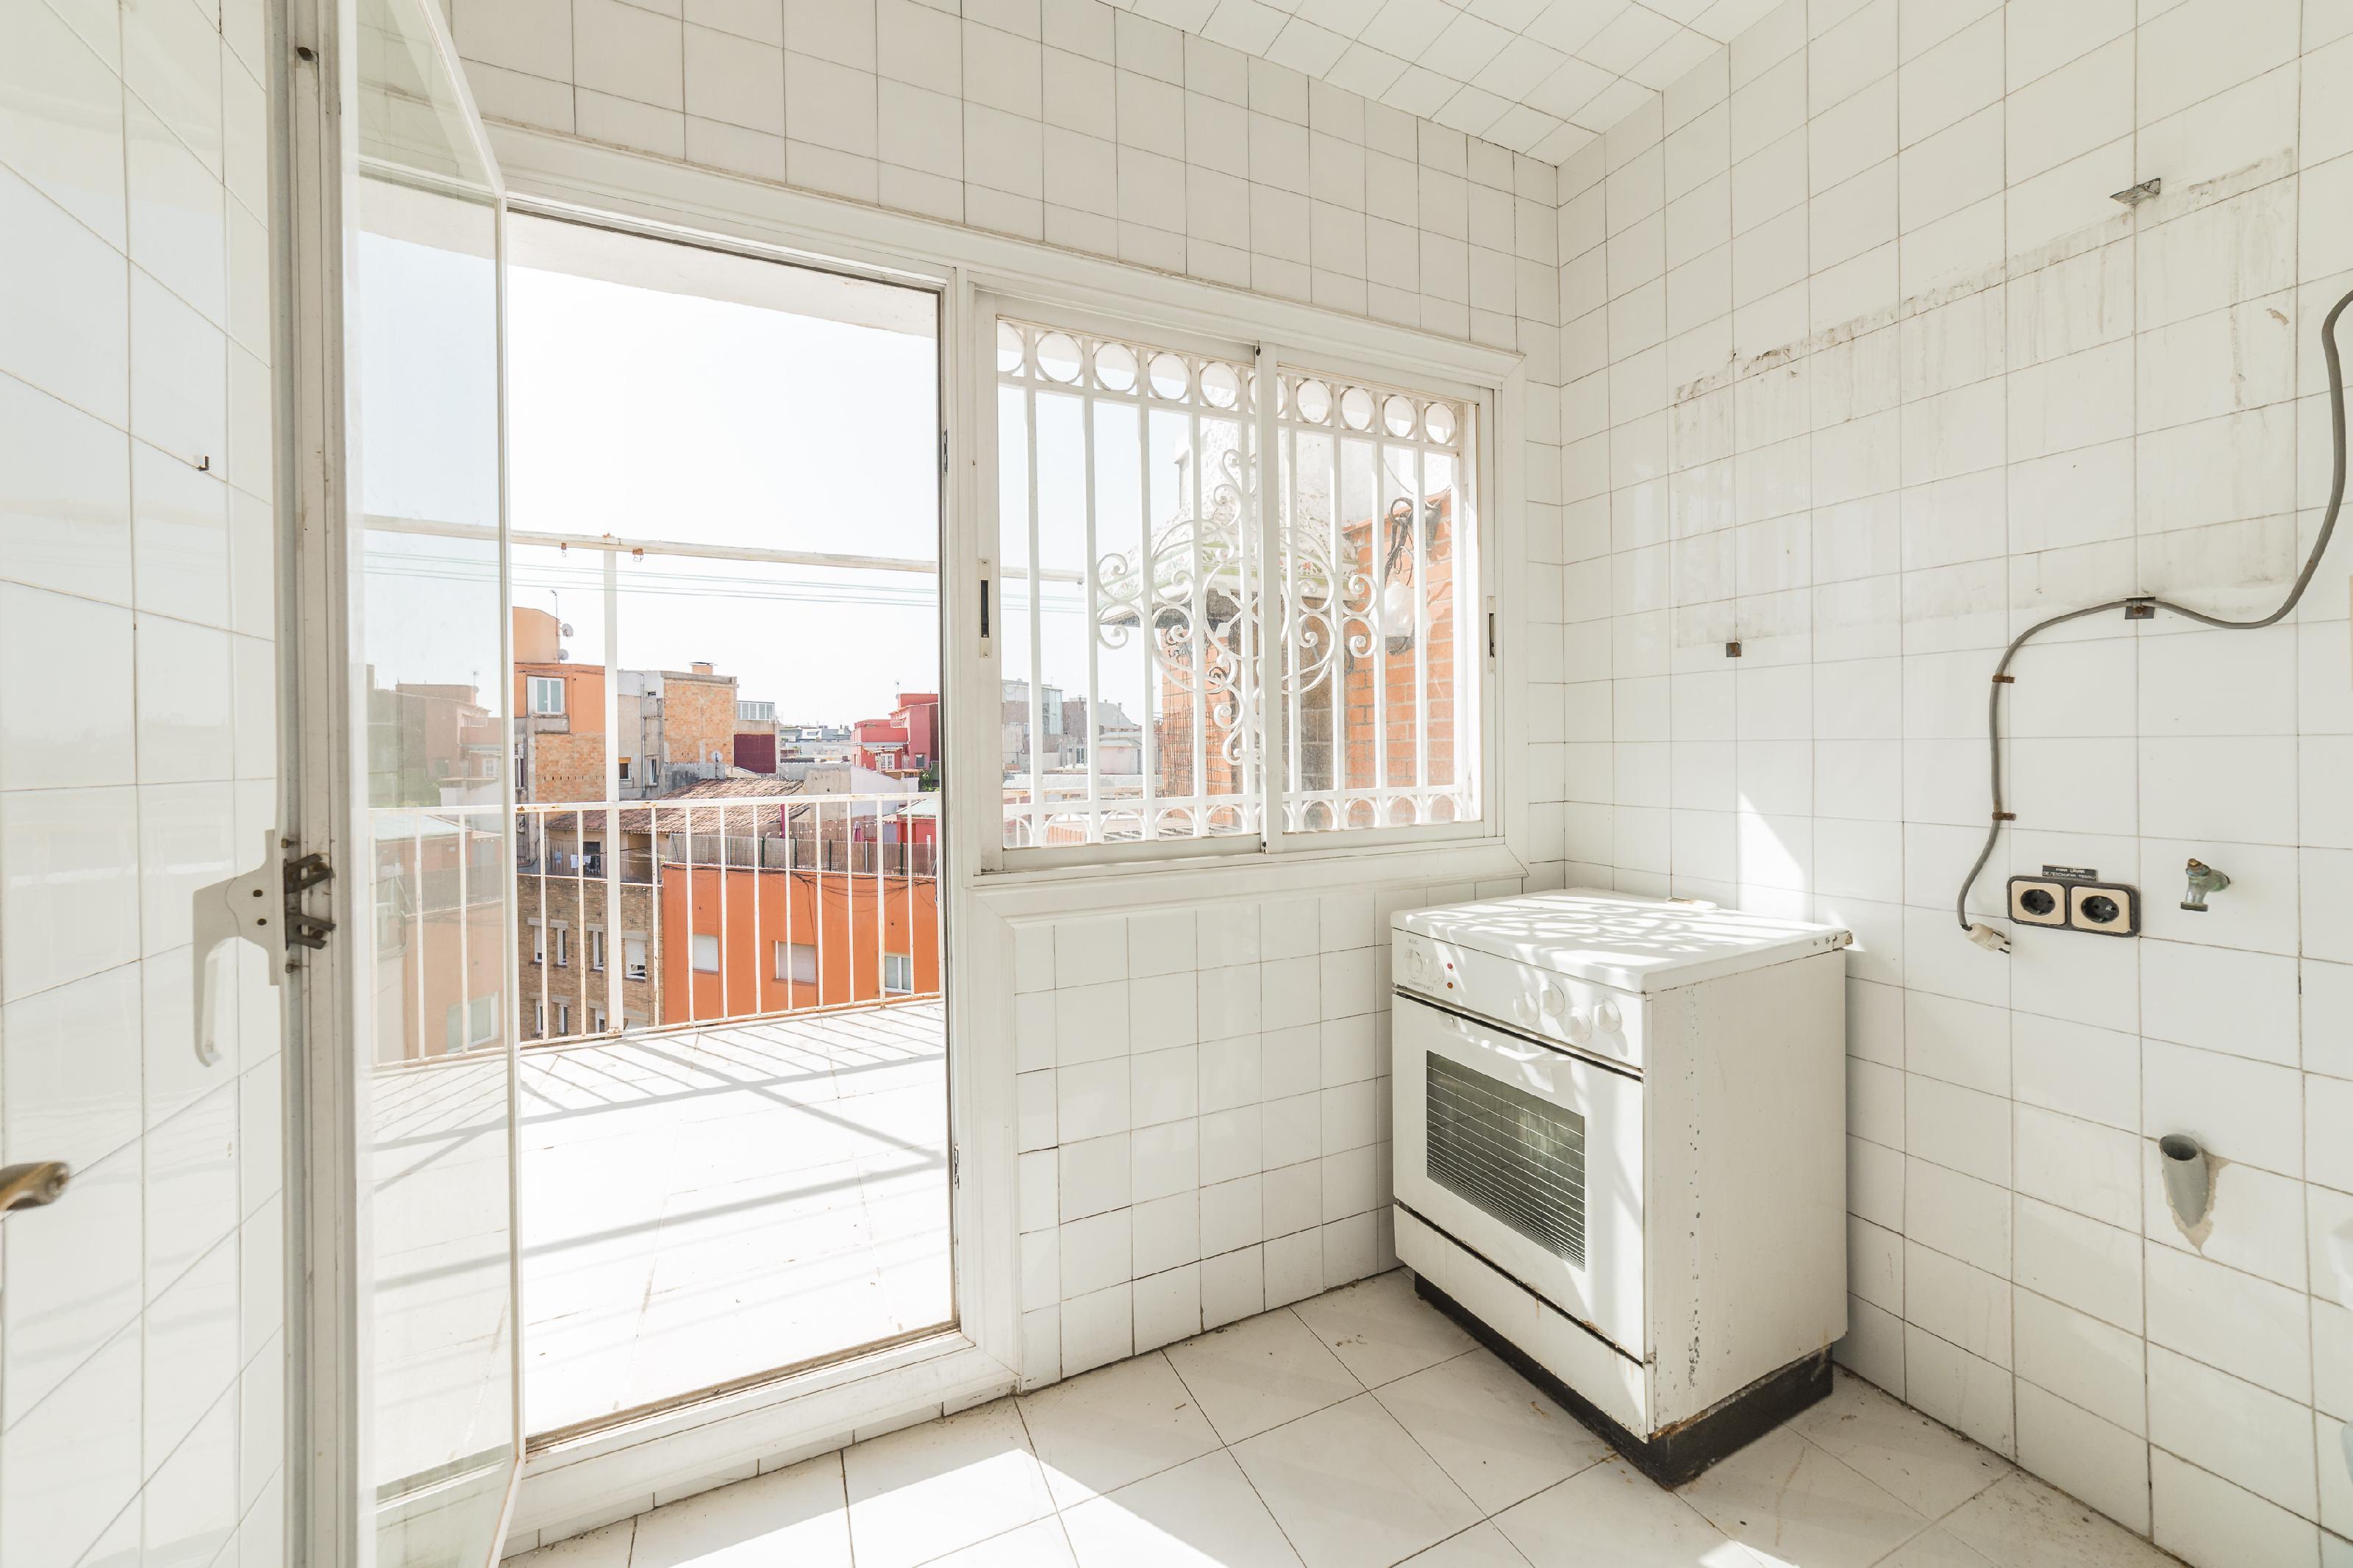 249314 Penthouse for sale in Sarrià-Sant Gervasi, Sant Gervasi-Galvany 30